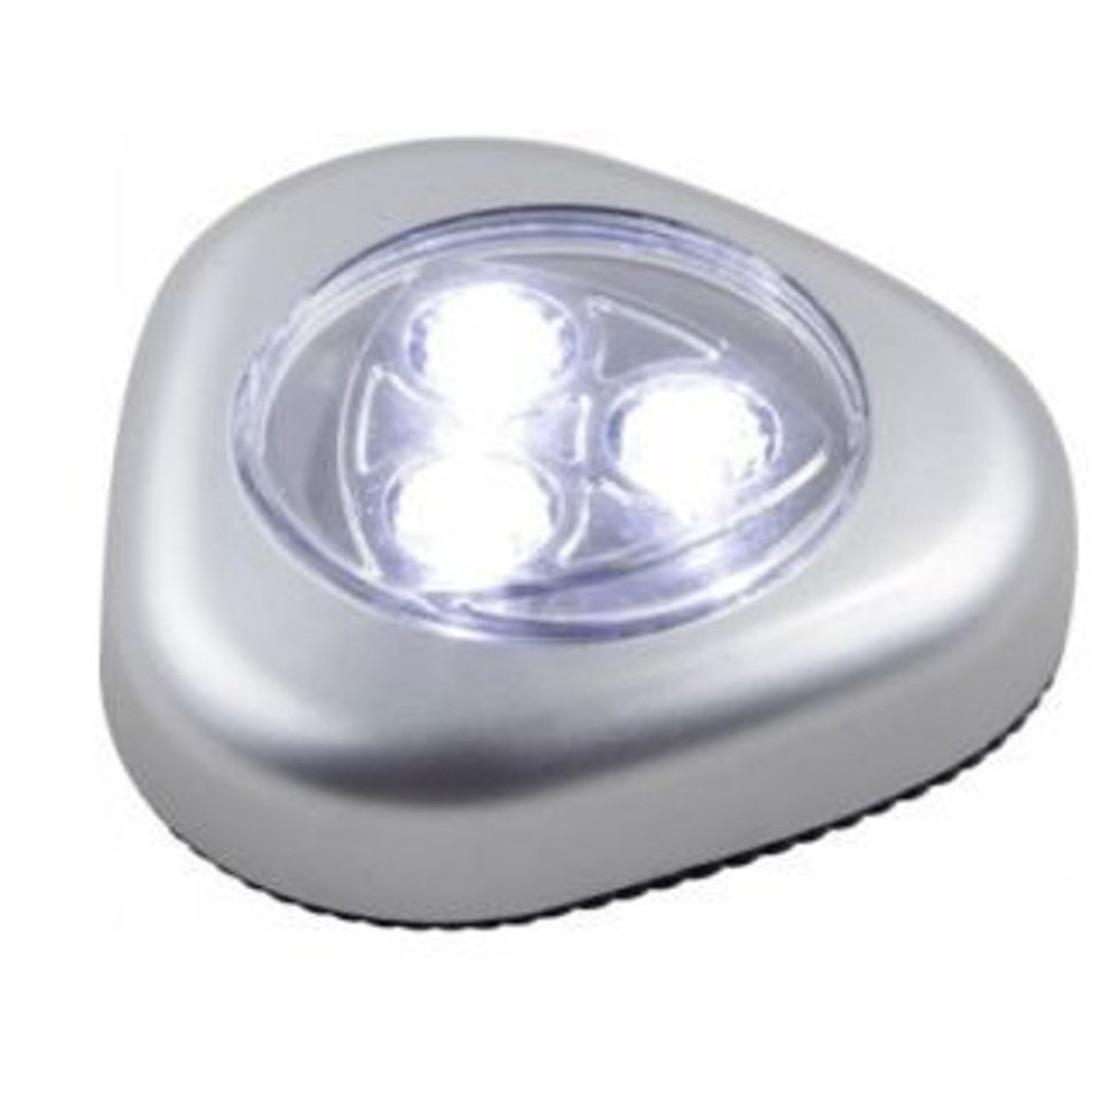 3er set globo lighting 31909 led flashlight pushlight silber 3 x0 2 4 99. Black Bedroom Furniture Sets. Home Design Ideas